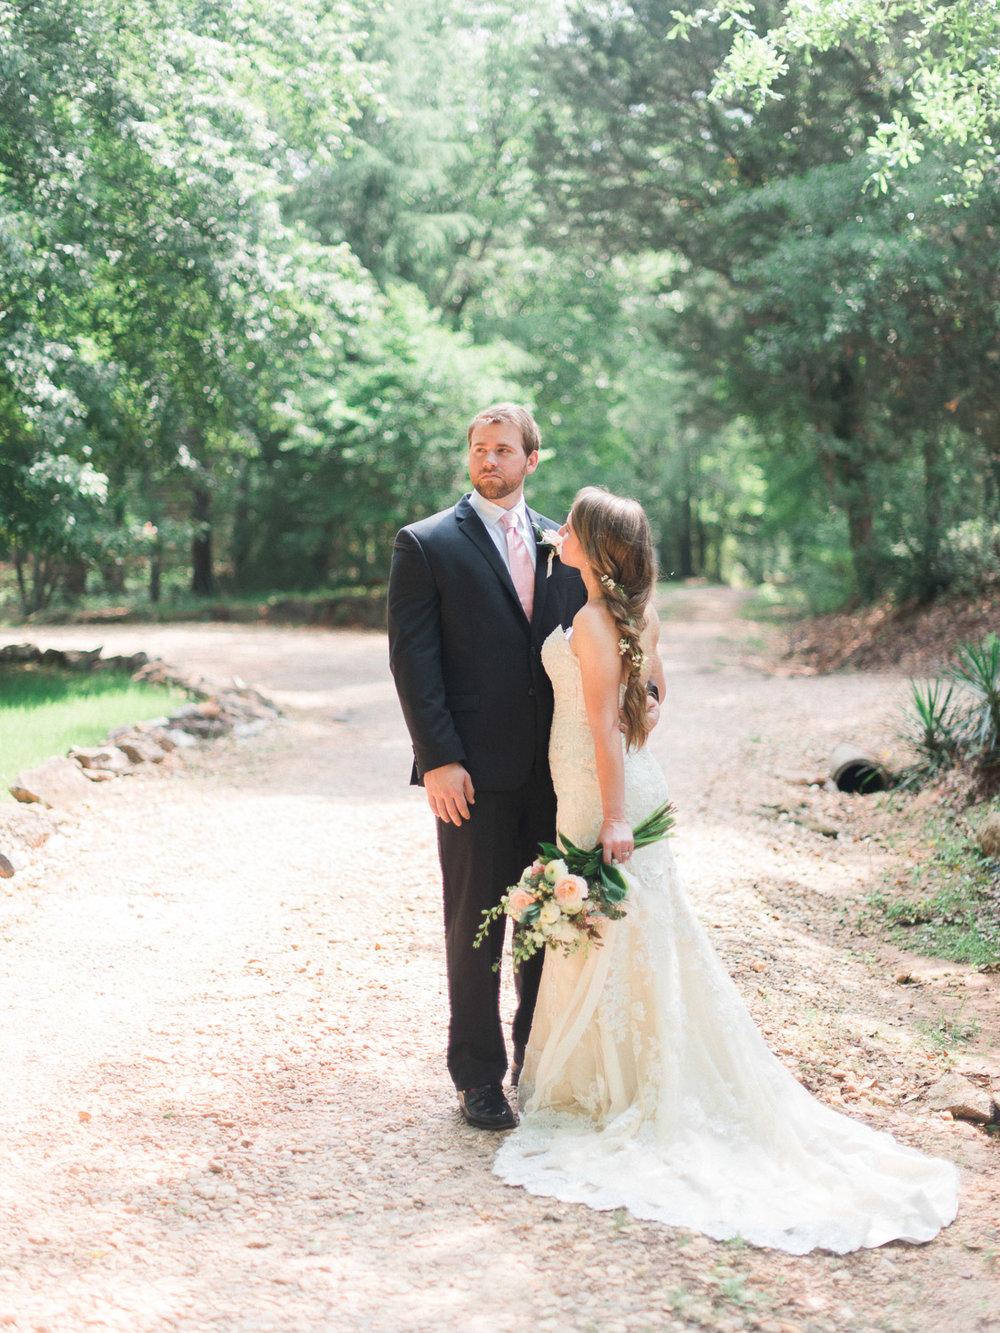 christinadavisphotography-romanticwedding-gardenweddinginspiration62.jpg